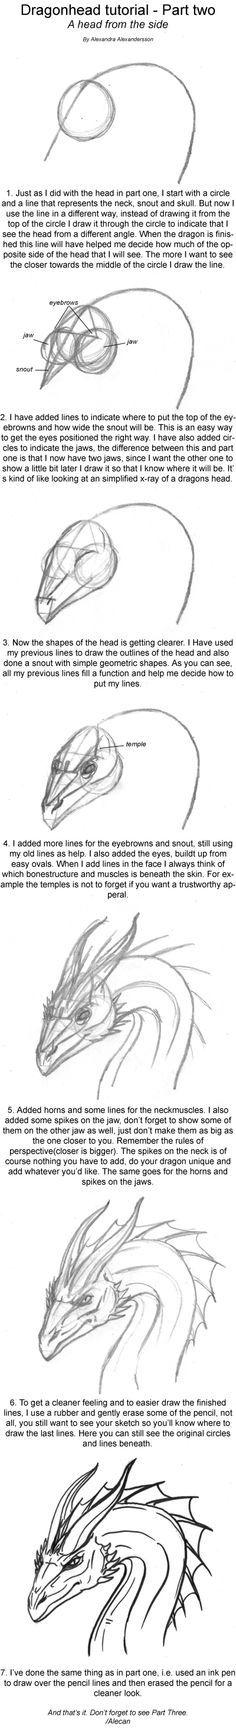 Dragonhead Tutorial part two by *alecan on deviantART